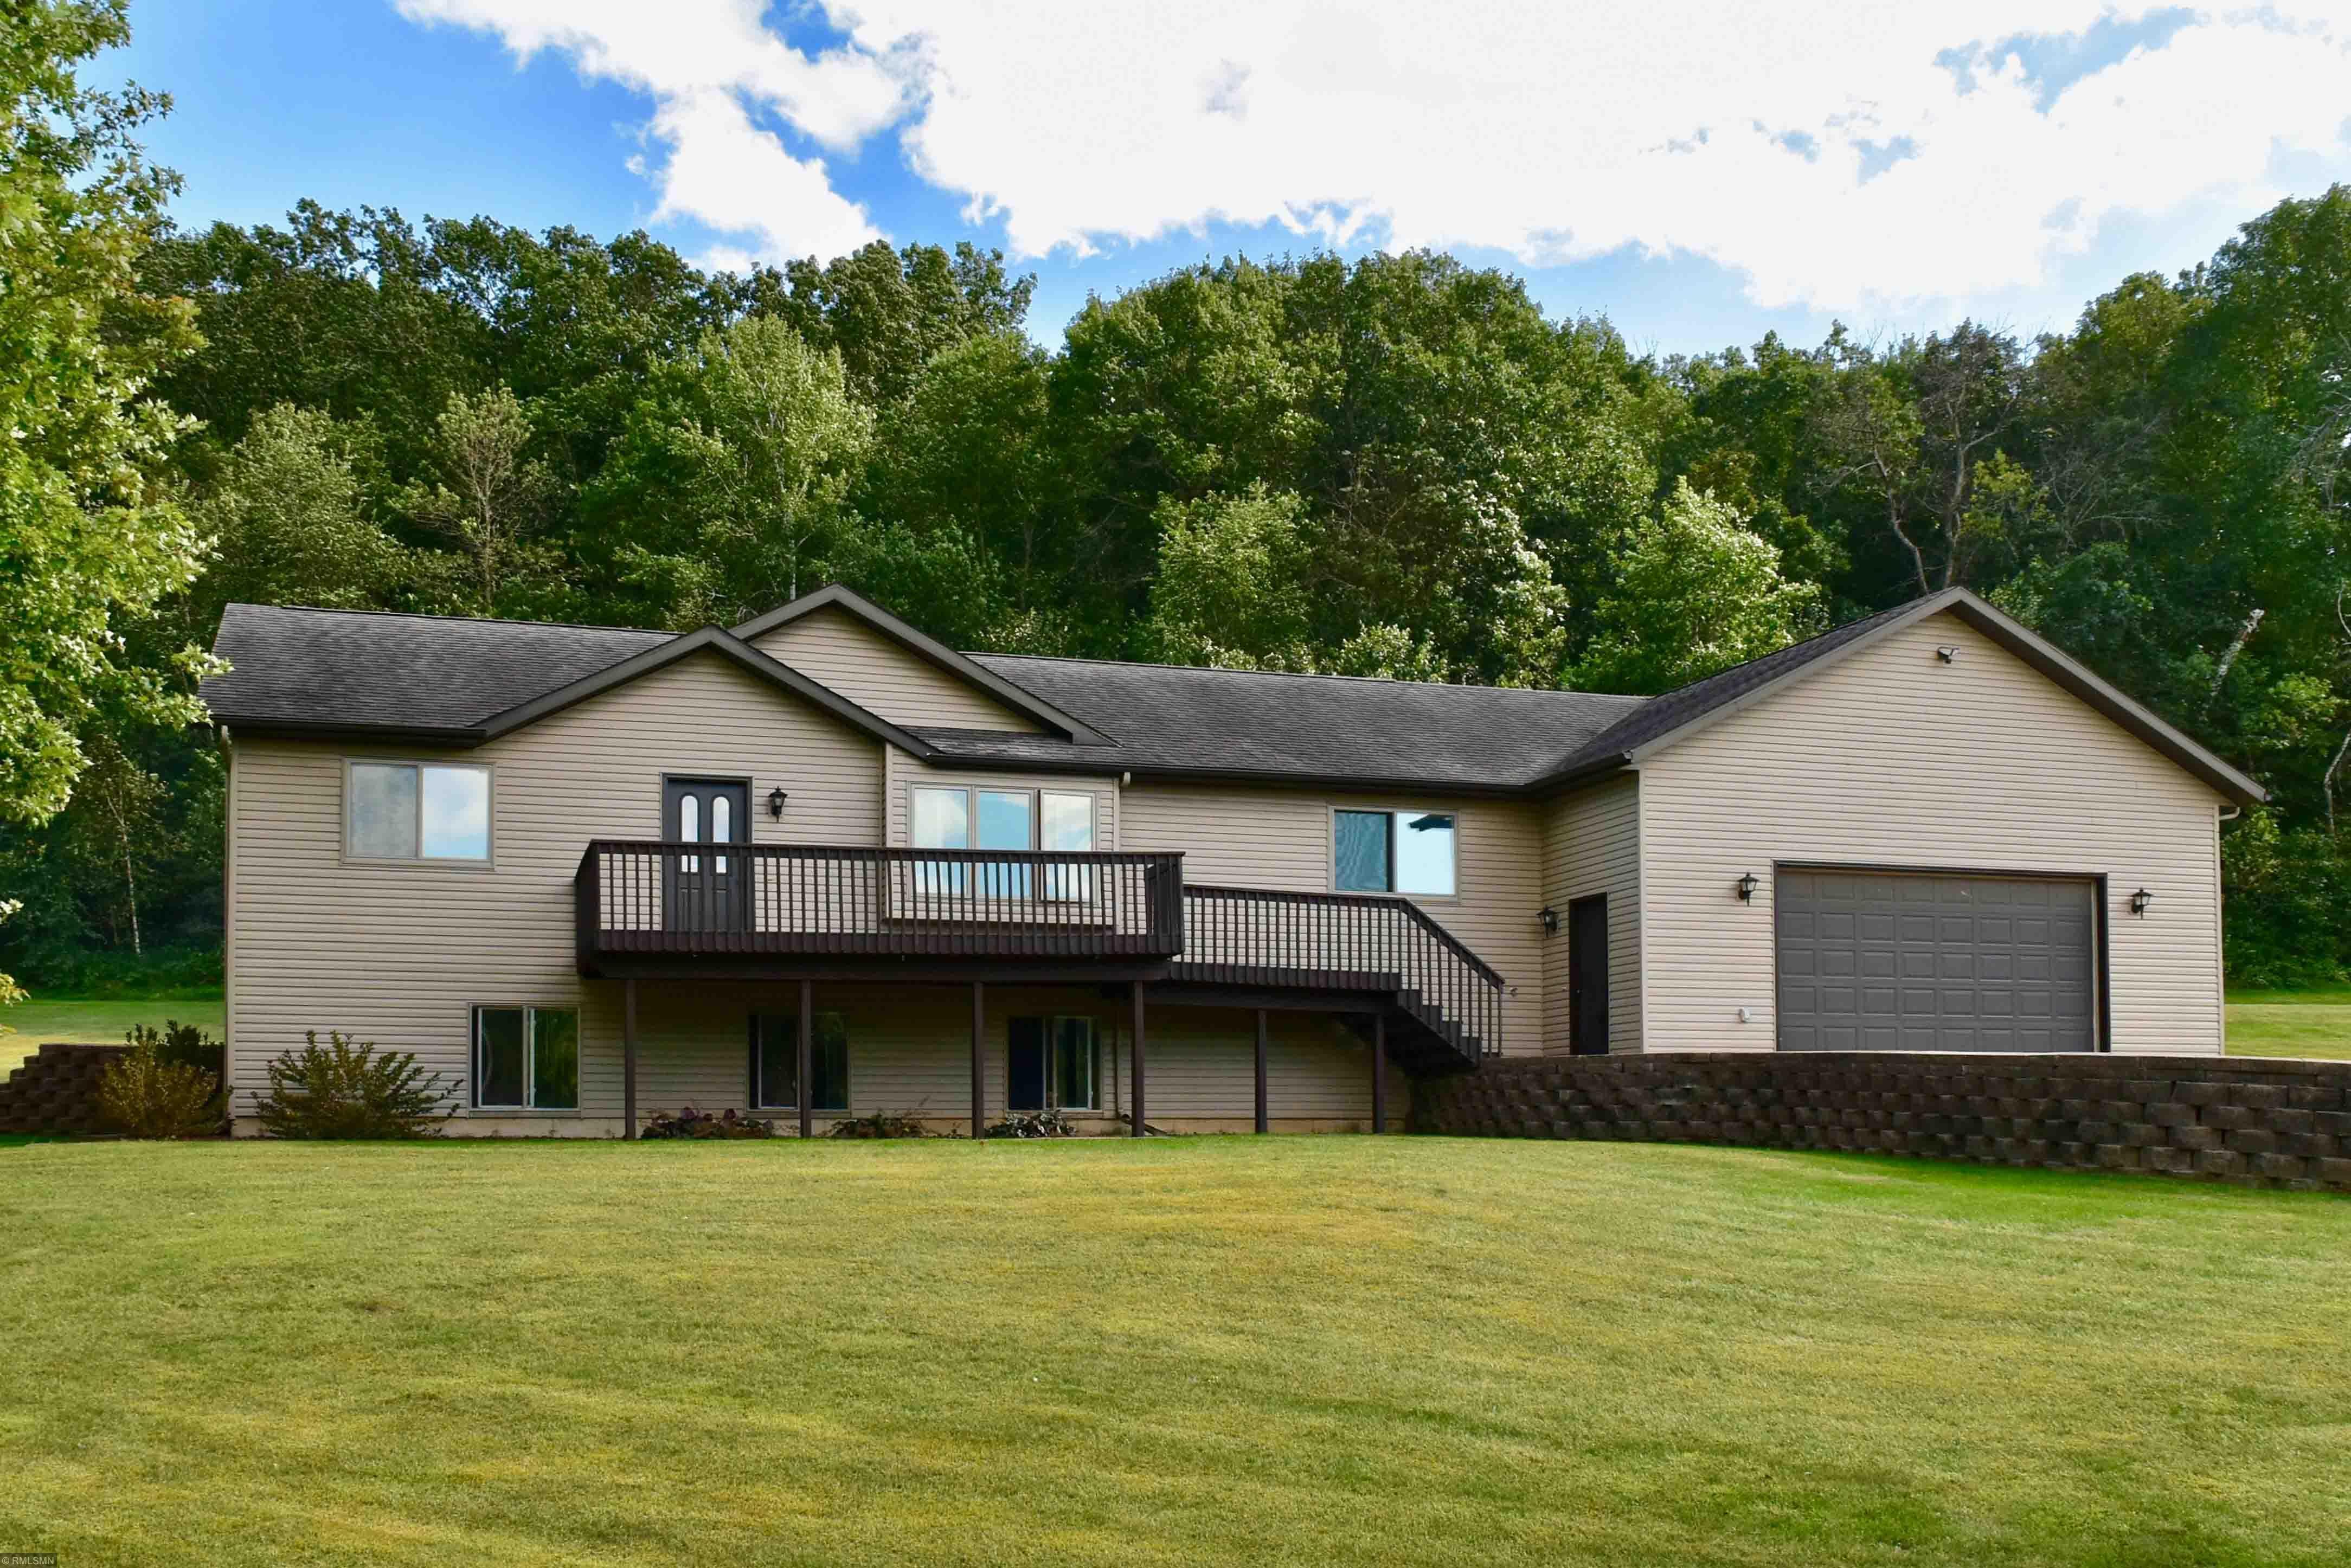 S2502 Wicka Road Property Photo - Cochrane, WI real estate listing